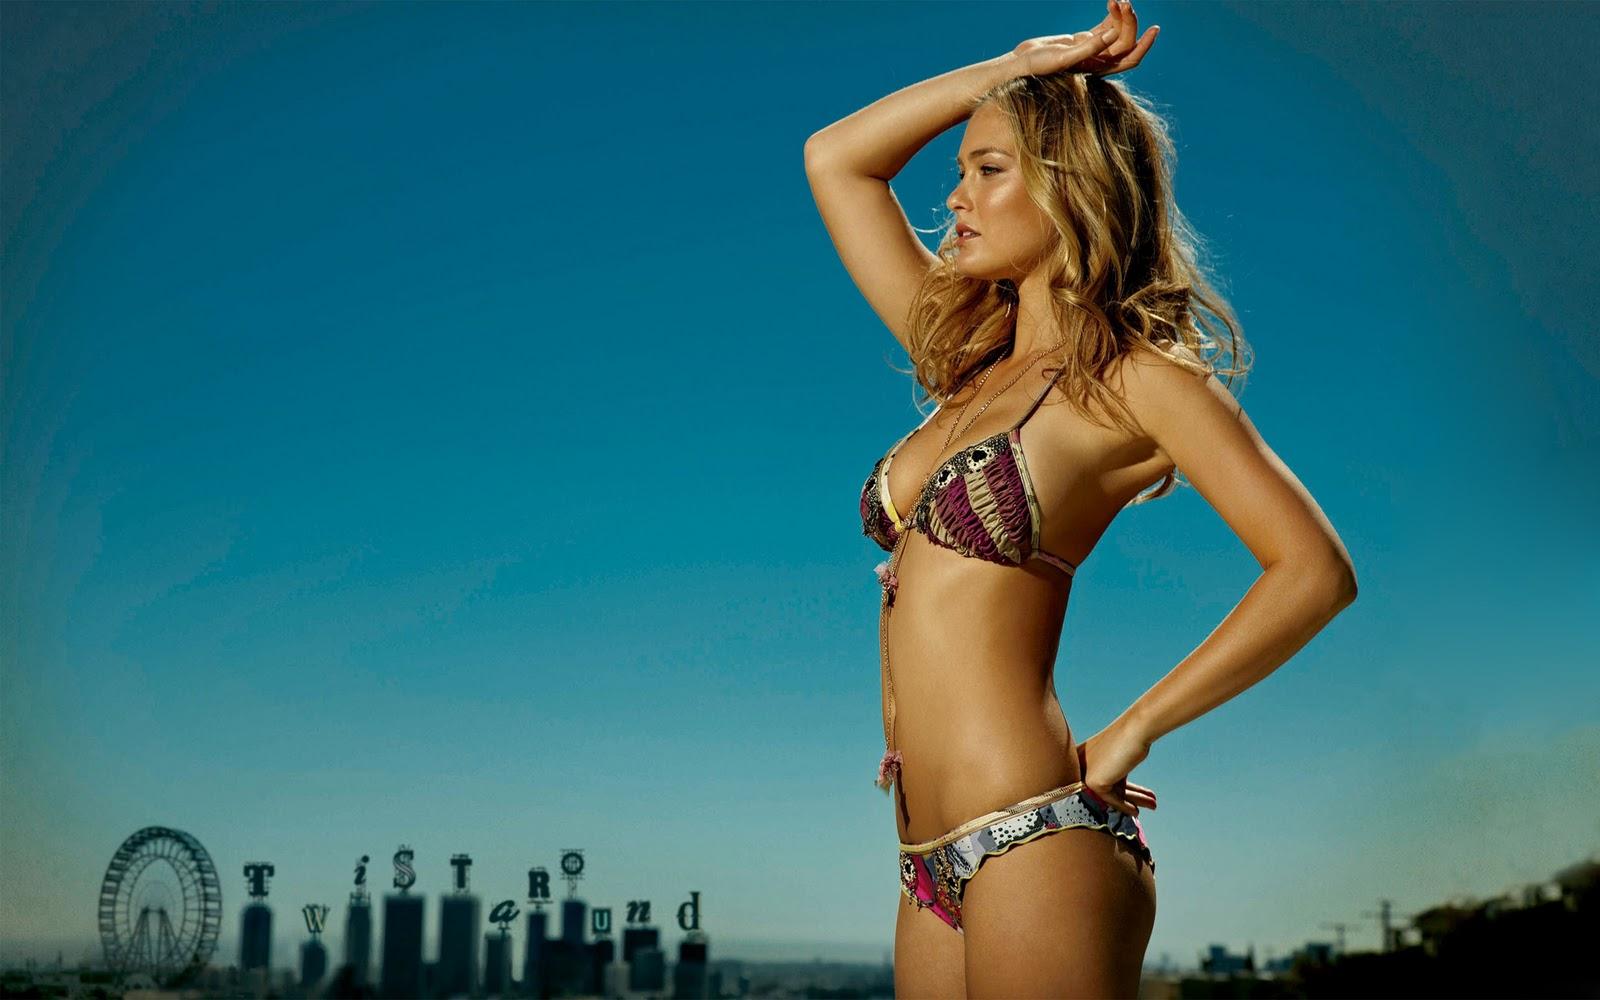 Bikini desktop wallpaper